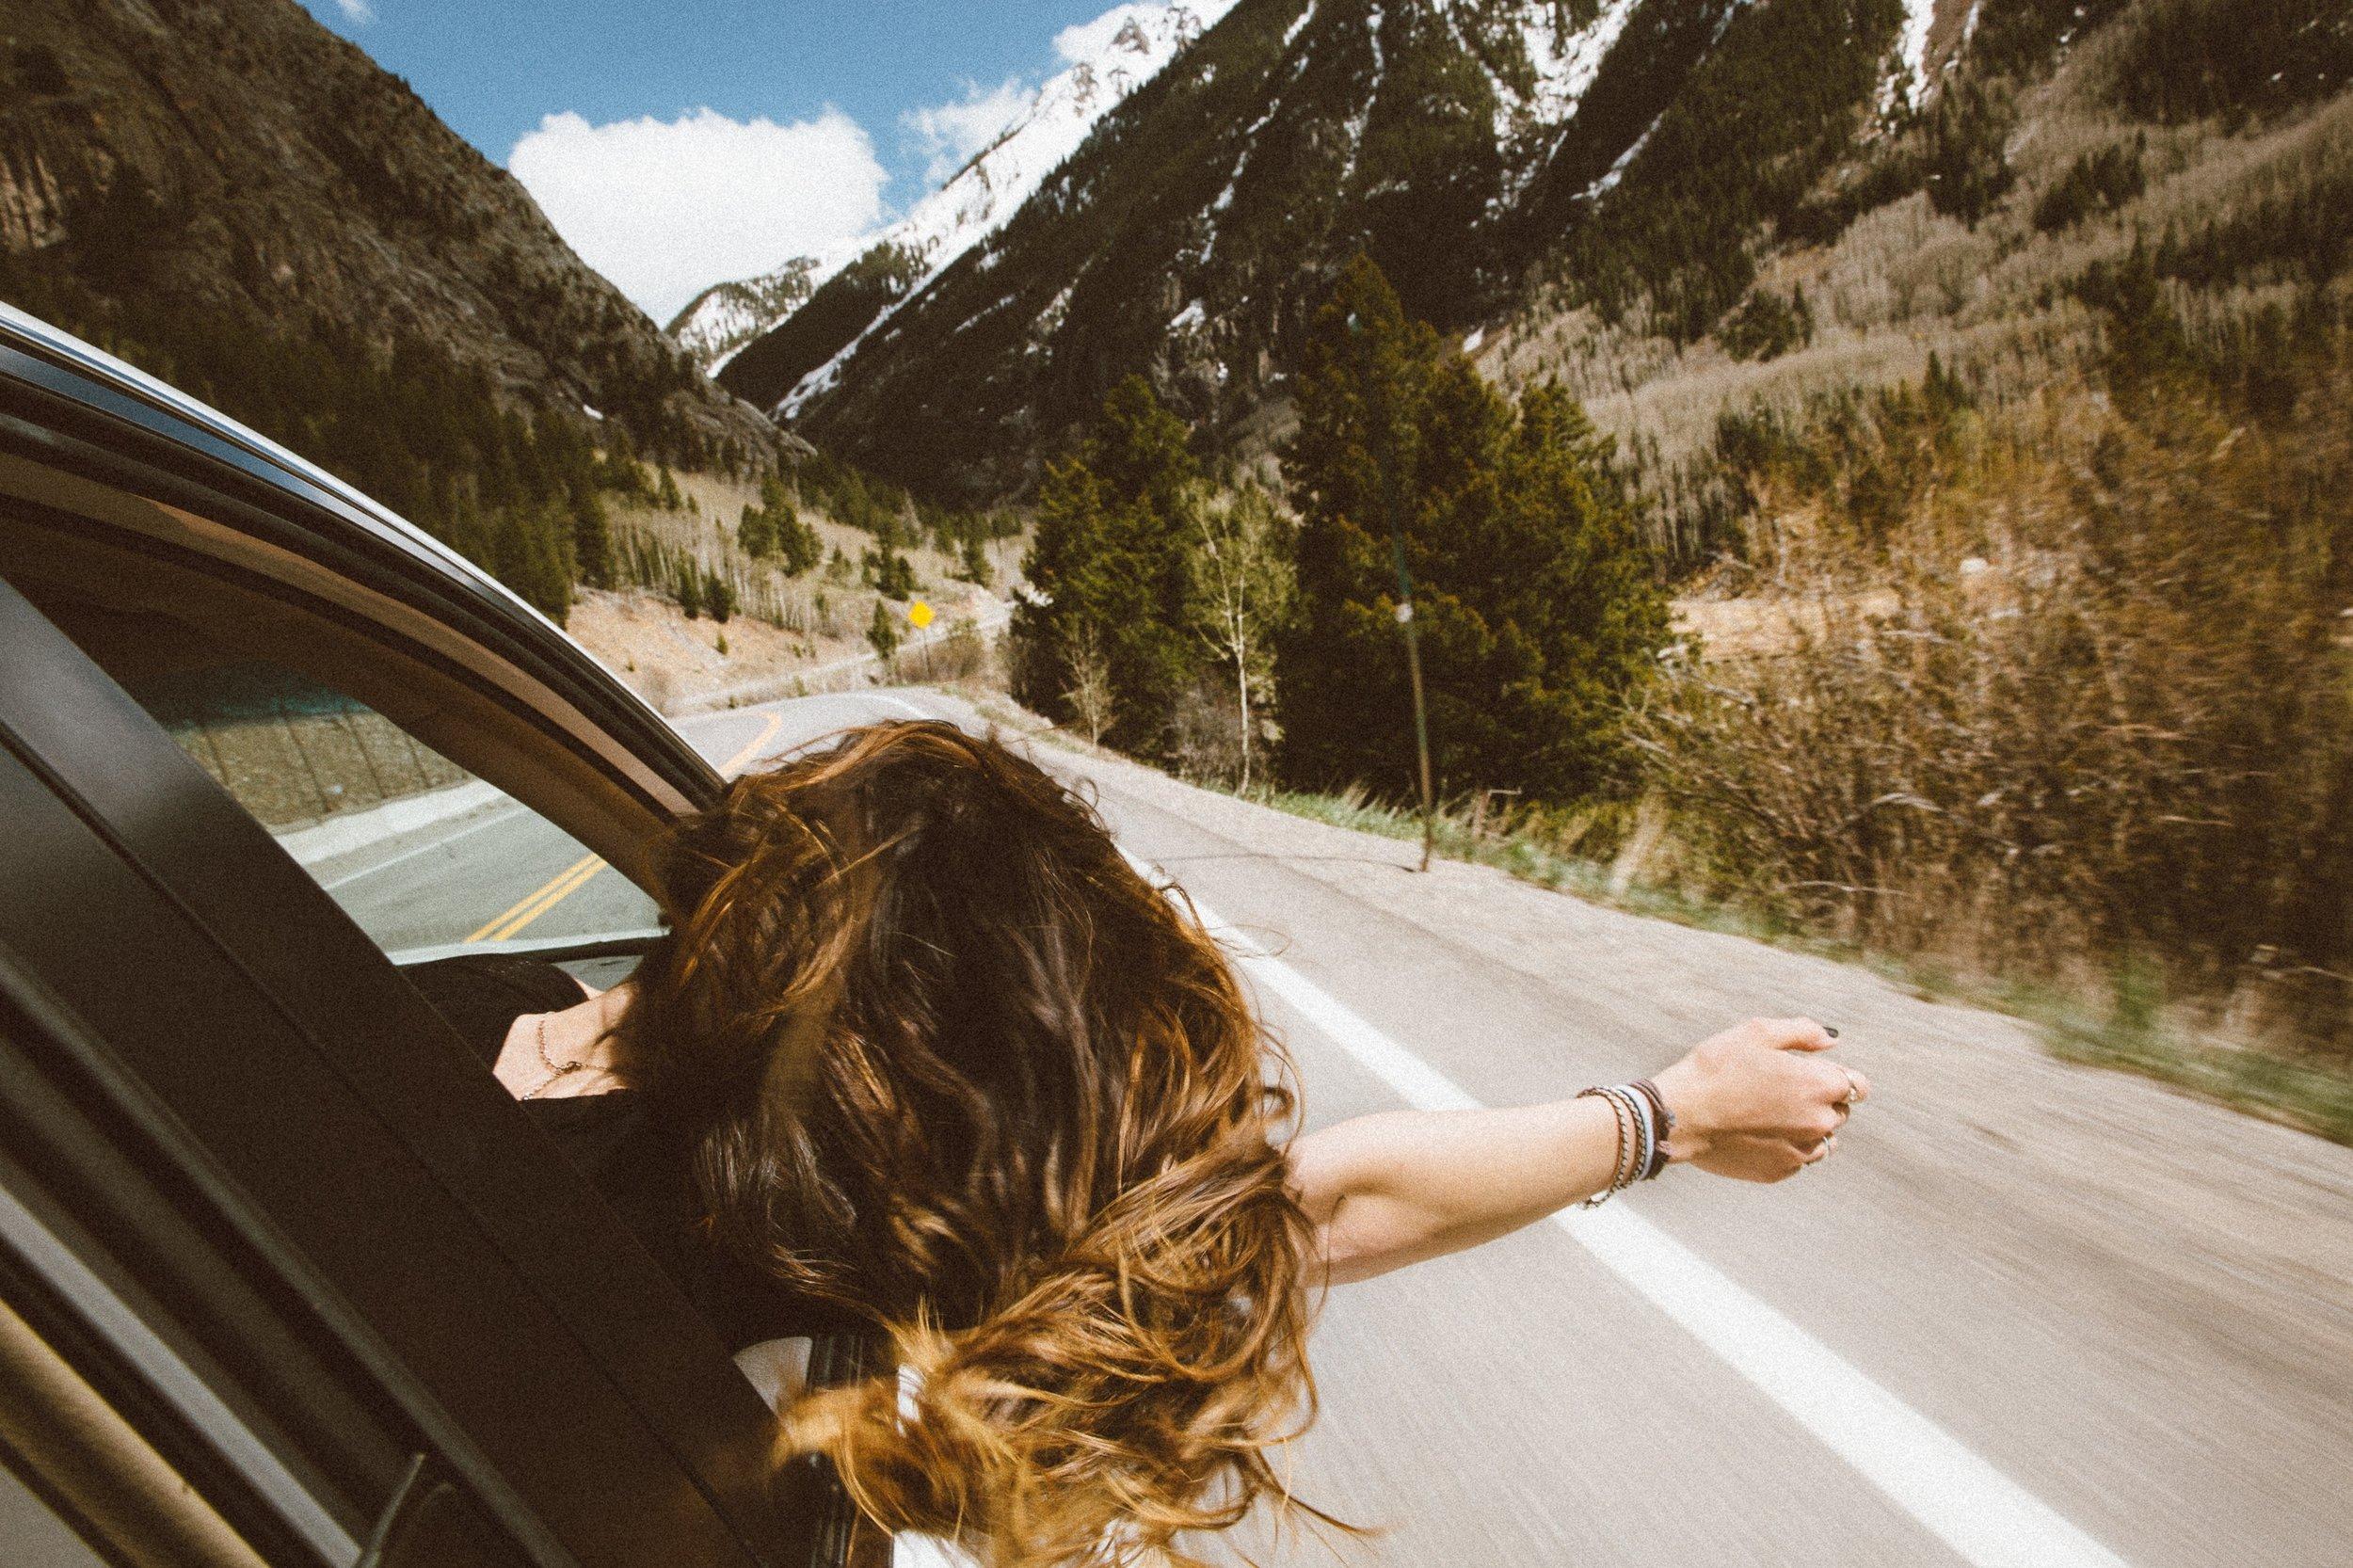 uwm.ecotravel.mountain-girl-hair-car-adventure-vacation-59874-pxhere.com